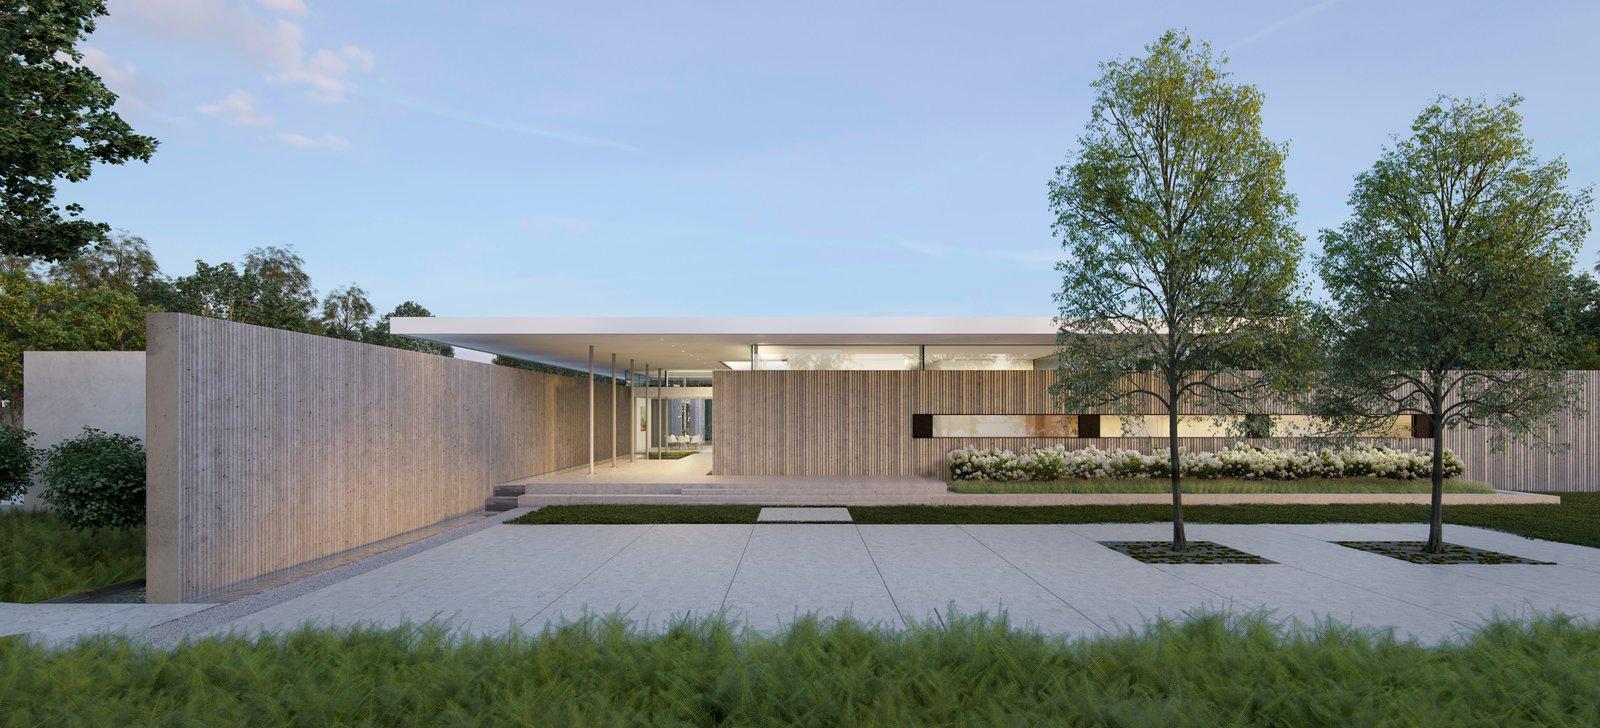 Preston Hollow, Exterior.   Preston Hollow by Specht Architects